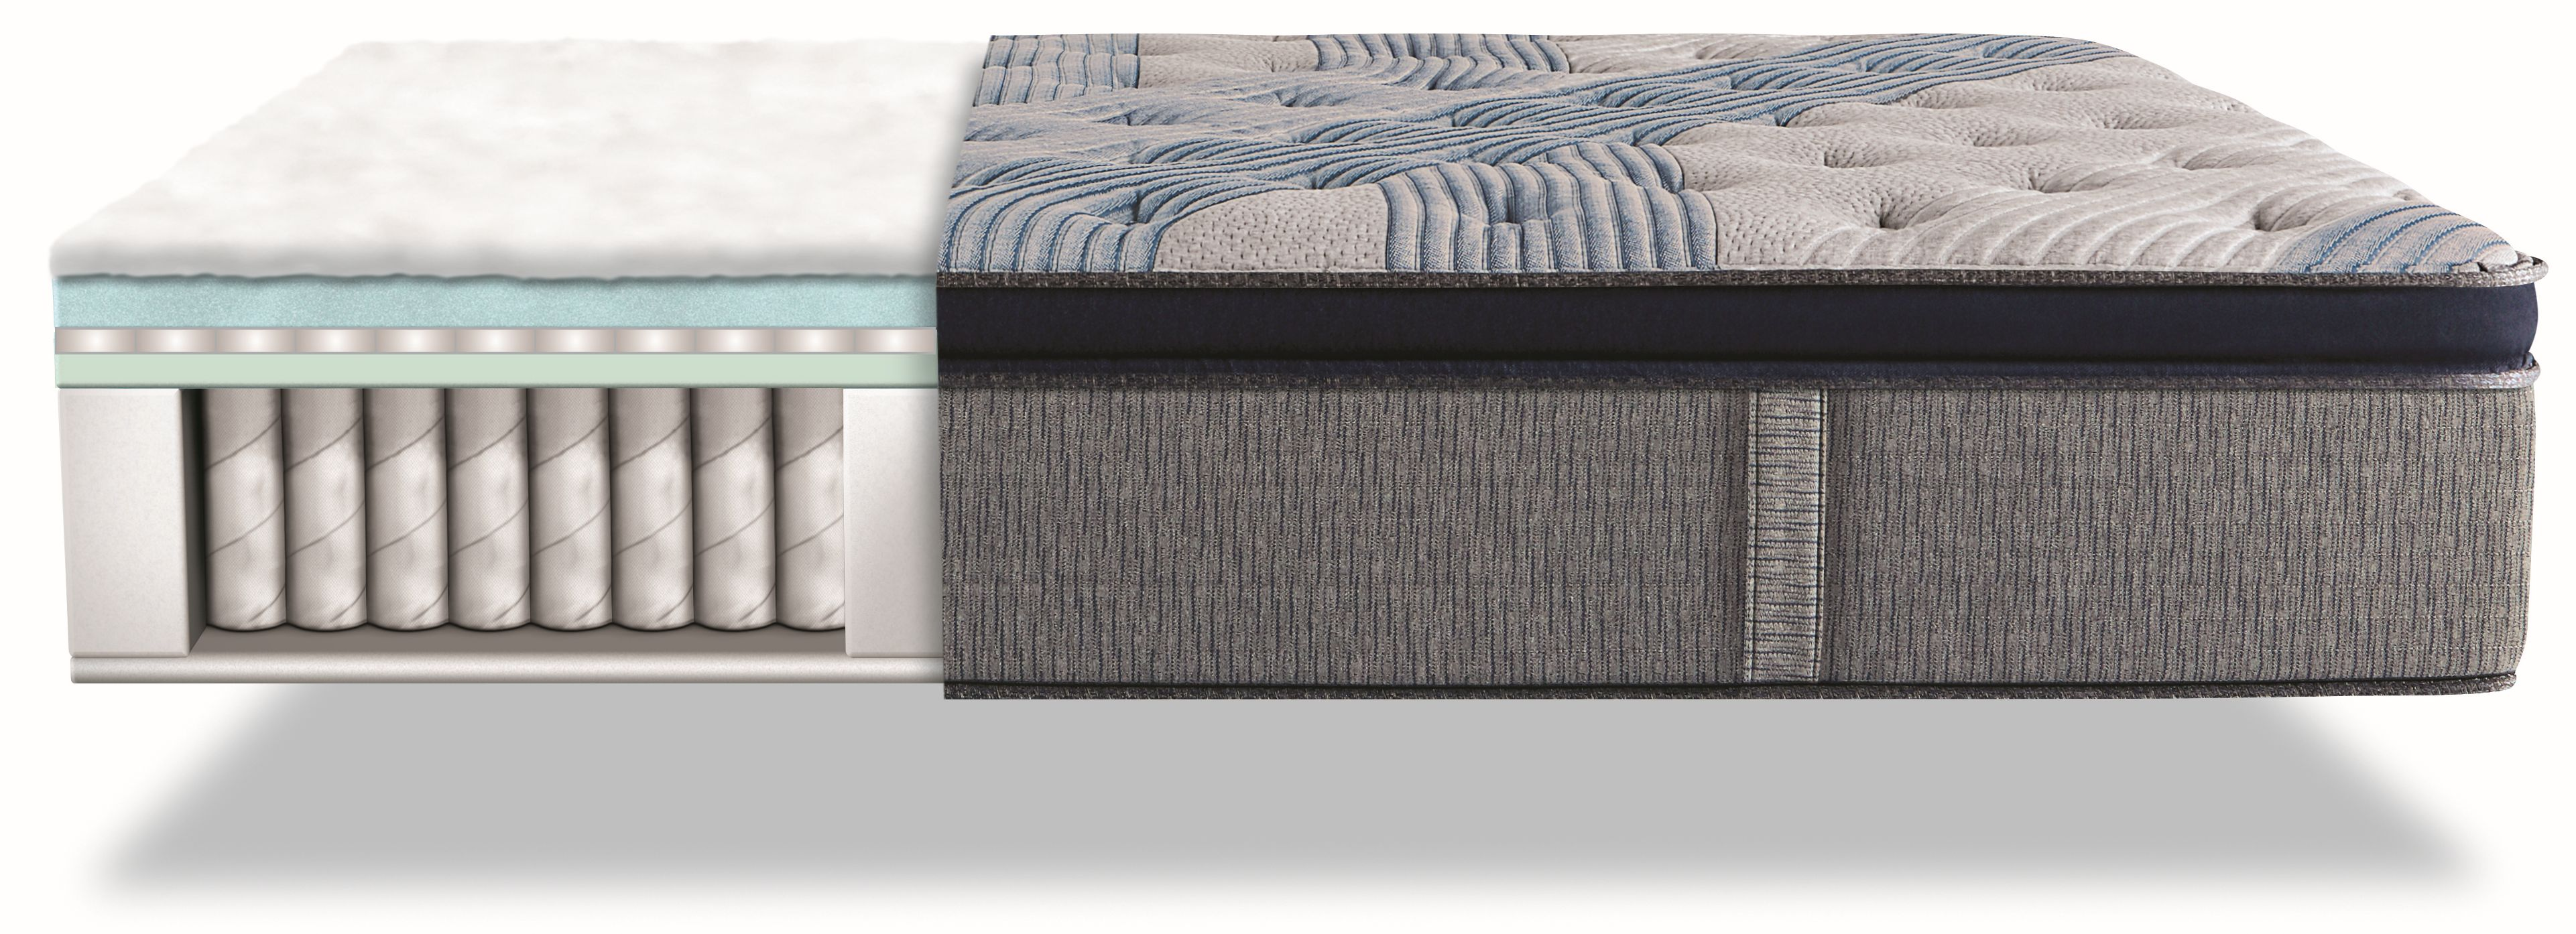 Serta 174 Icomfort 174 Hybrid Blue Fusion 4000 Plush Pillow Top